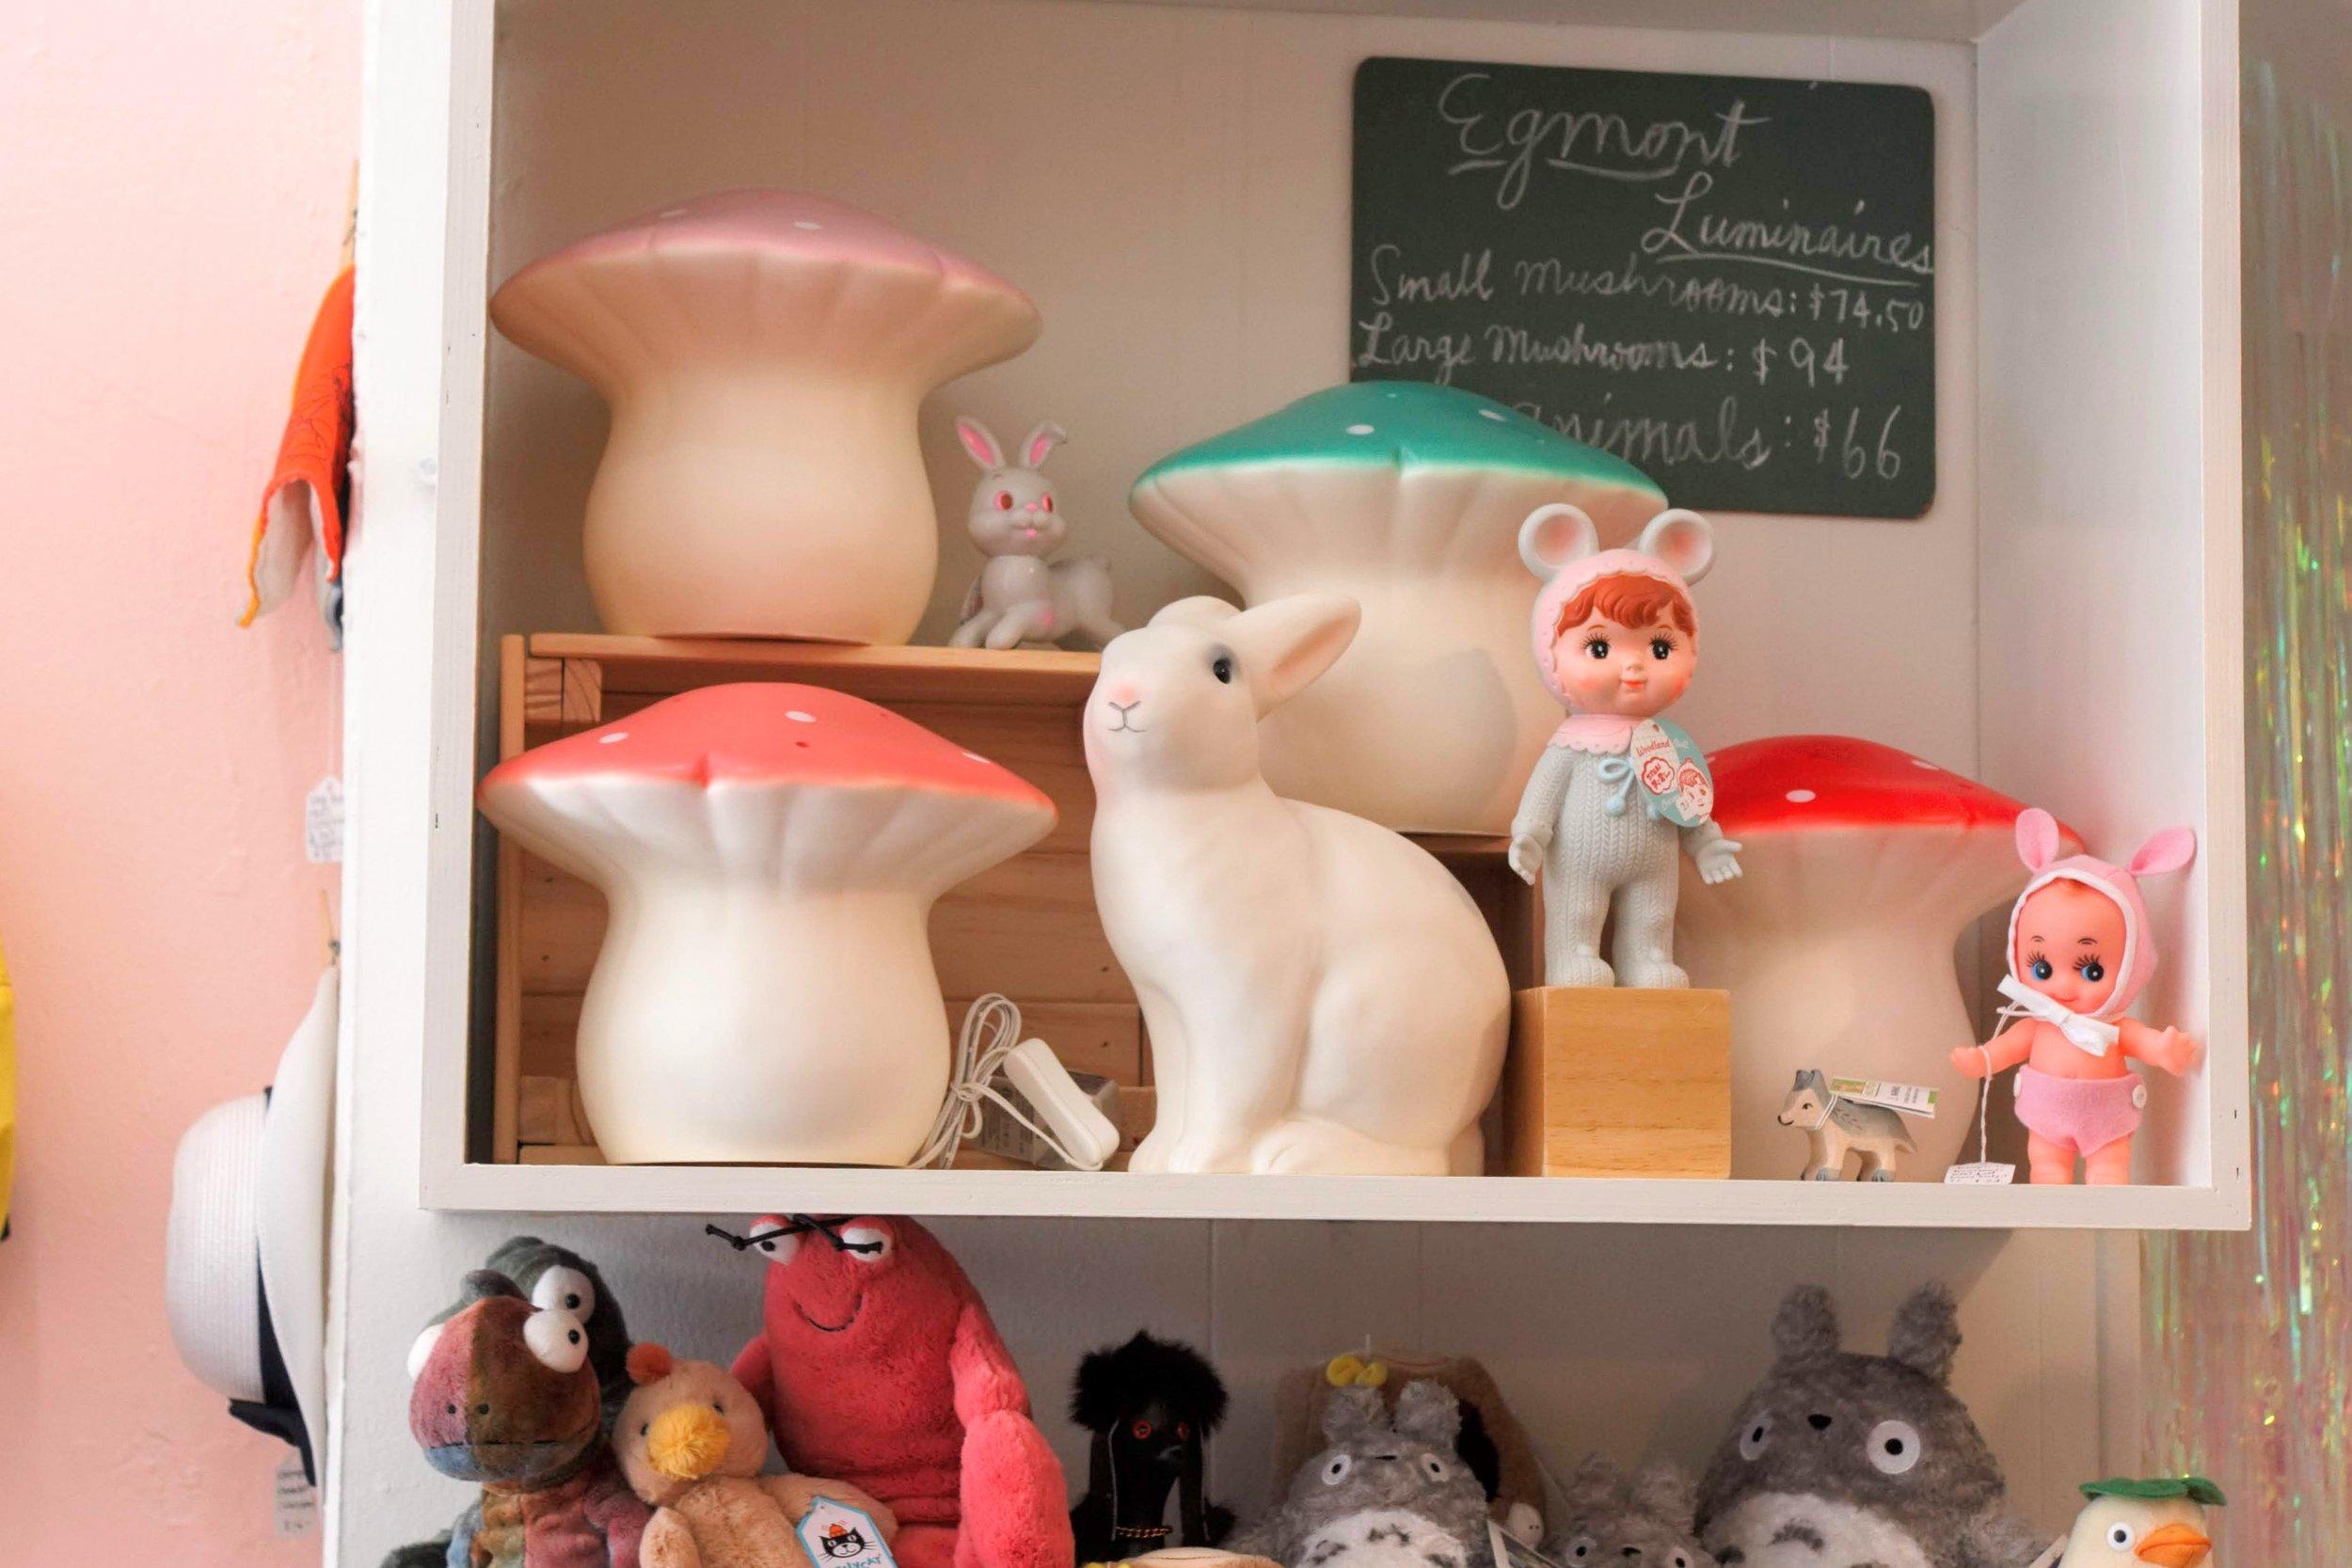 Mushroom lamps, Lapin & Me dolls, Jelly Cat stuffed animals, and Totoros!